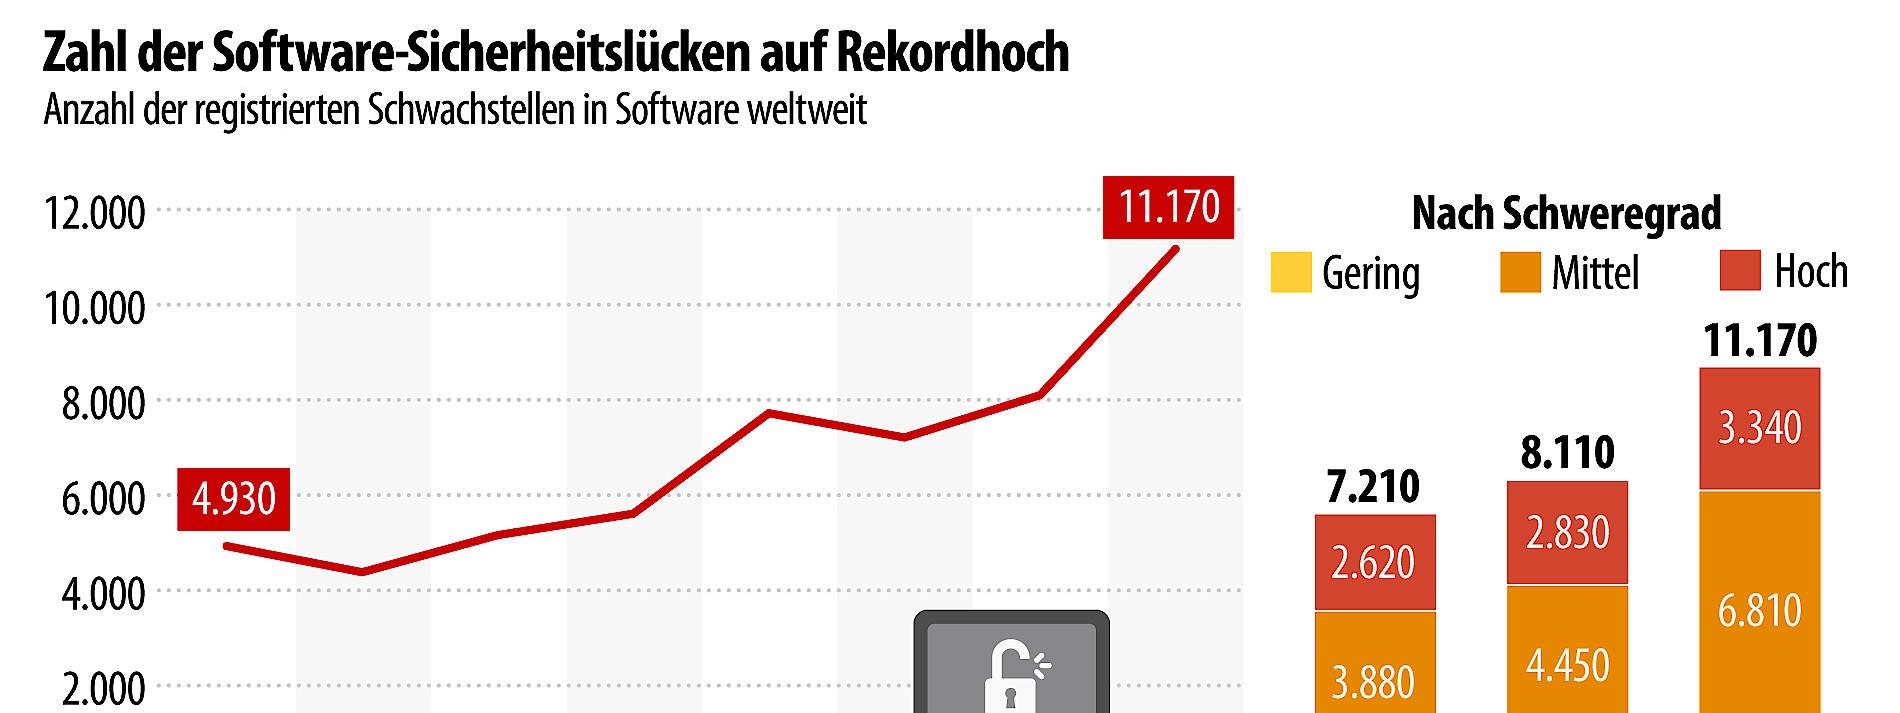 Wird Software immer unsicherer?